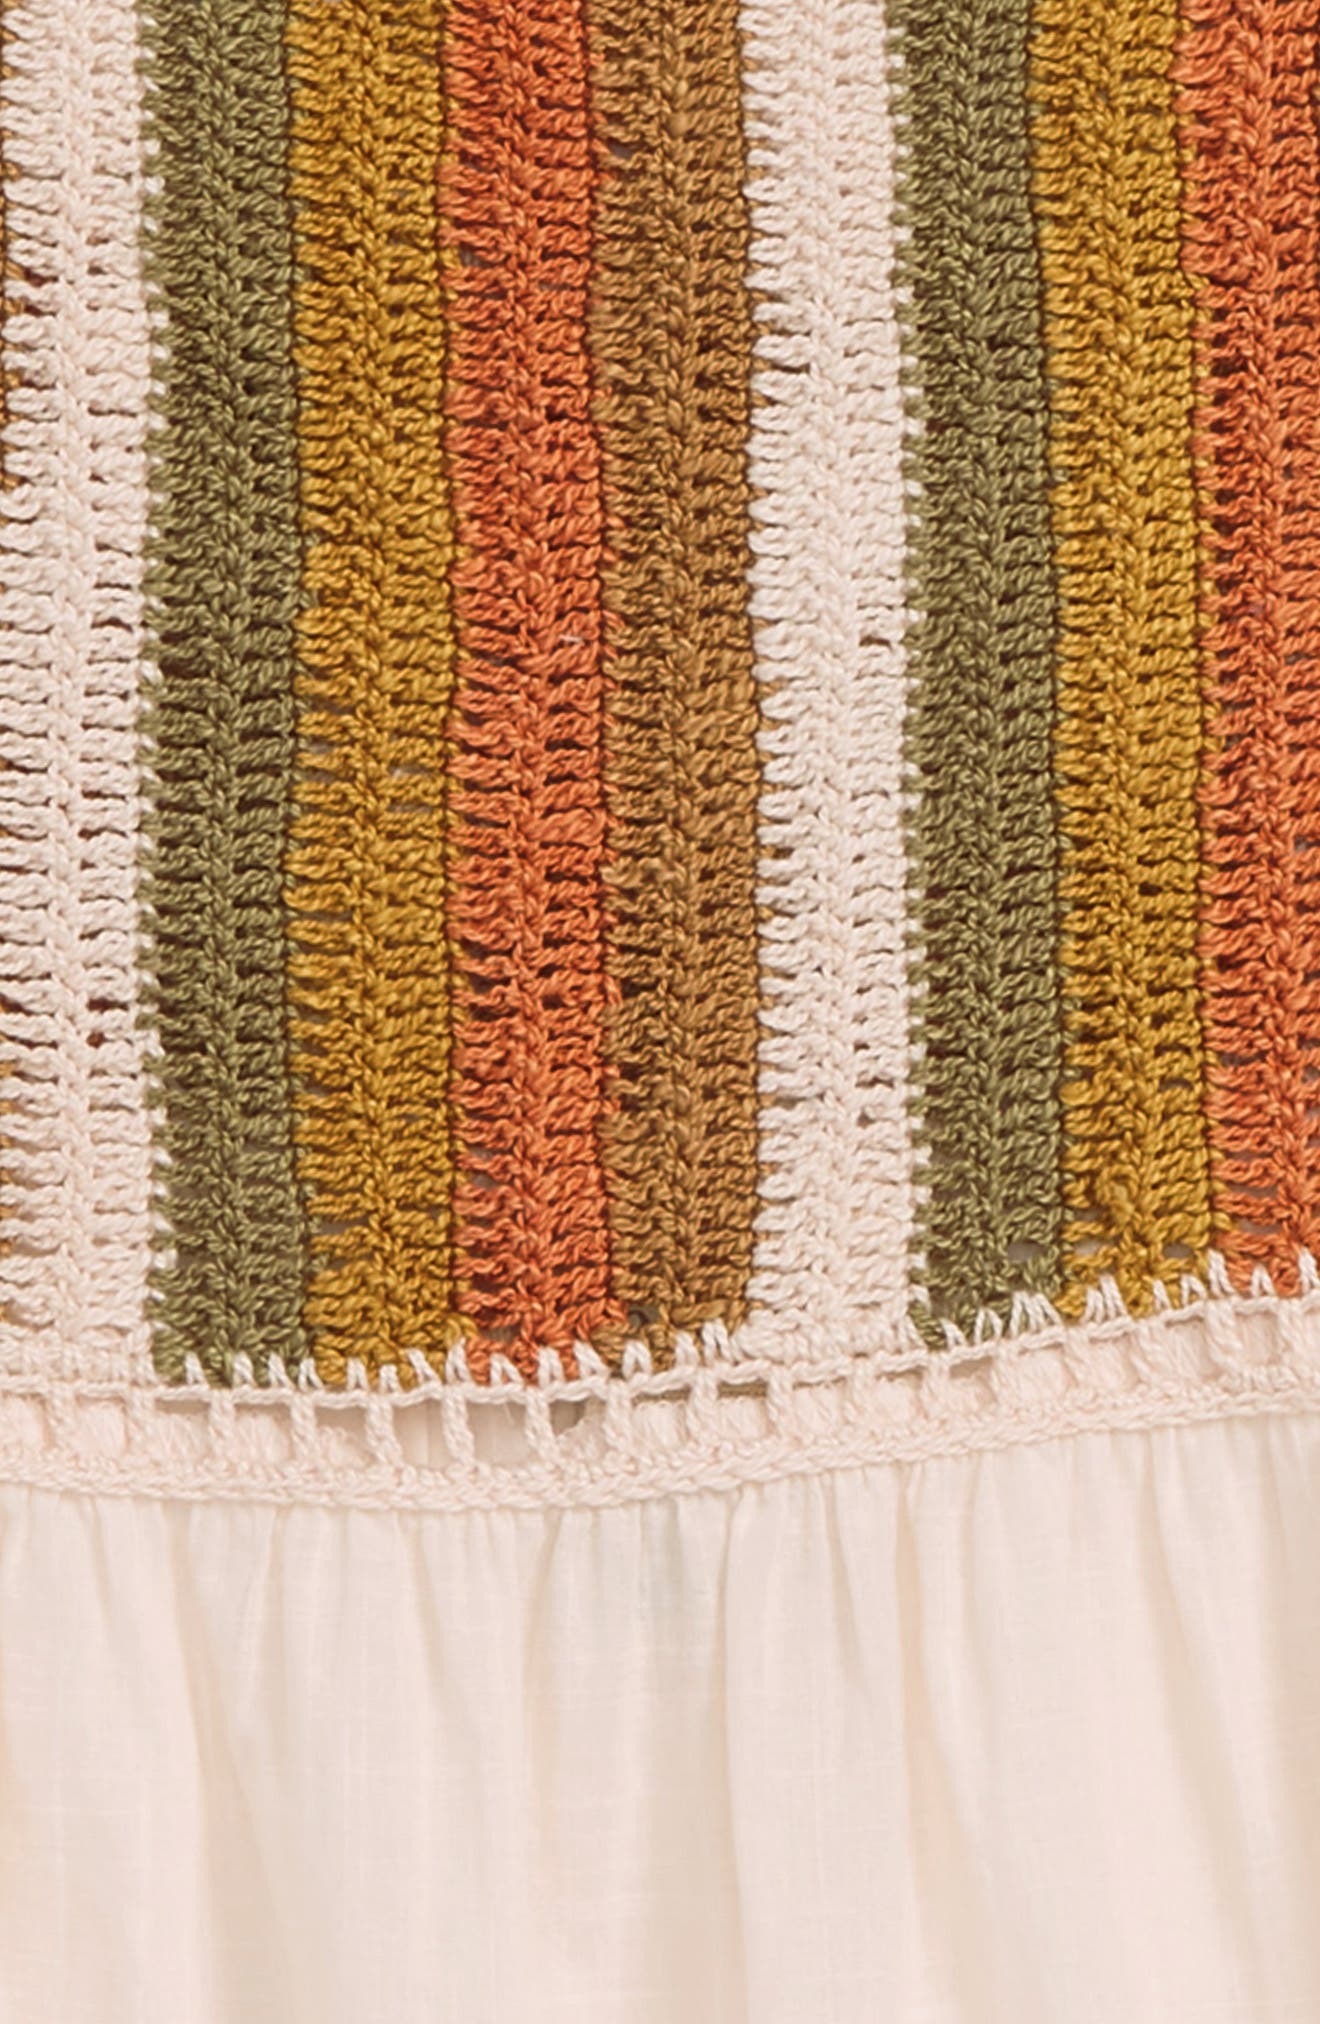 Presley Crochet Tank,                             Alternate thumbnail 2, color,                             950